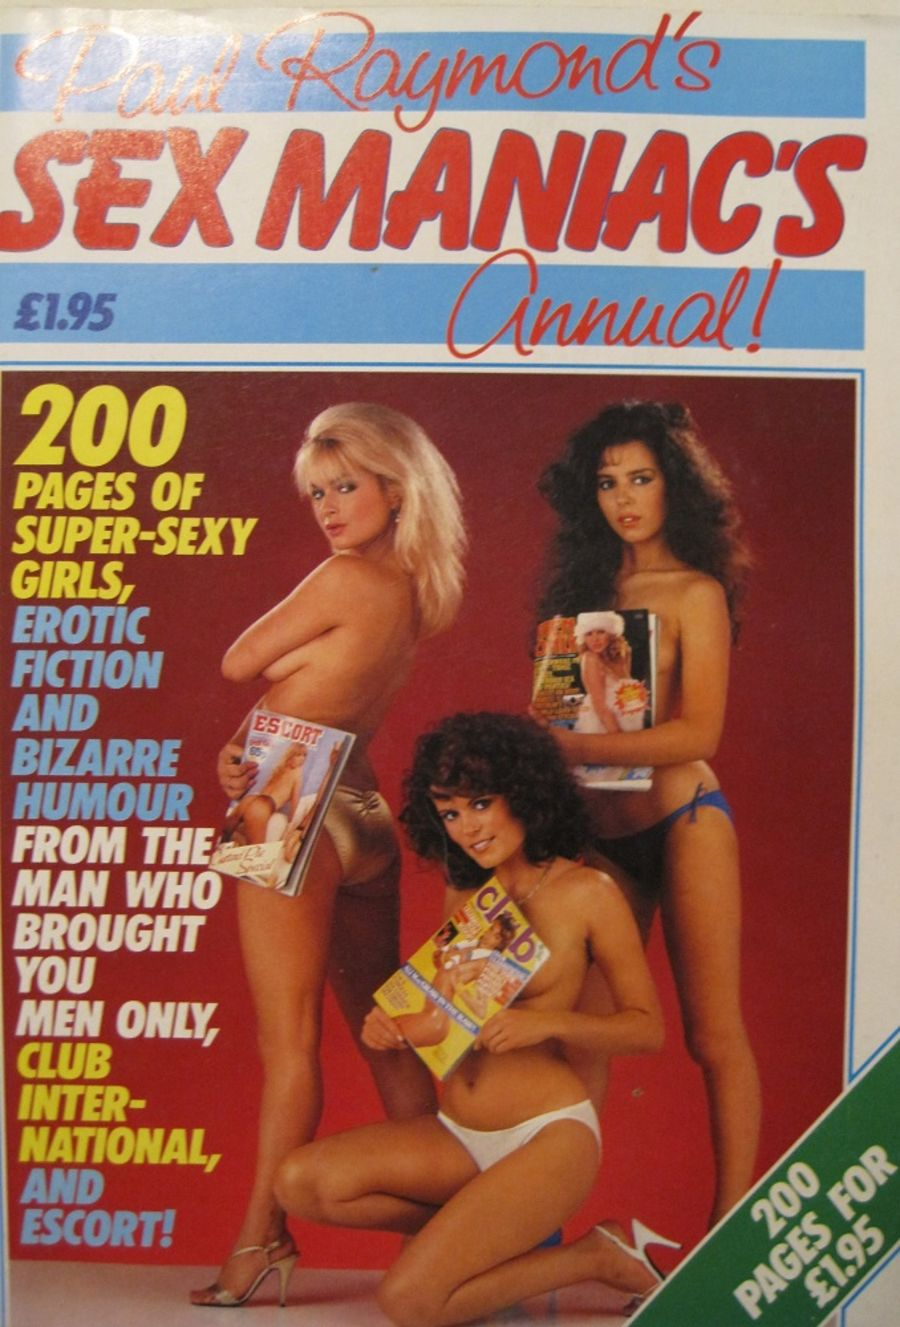 SEX MANIAC'S ANNUAL. 1982 VINTAGE MEN'S MAGAZINE.